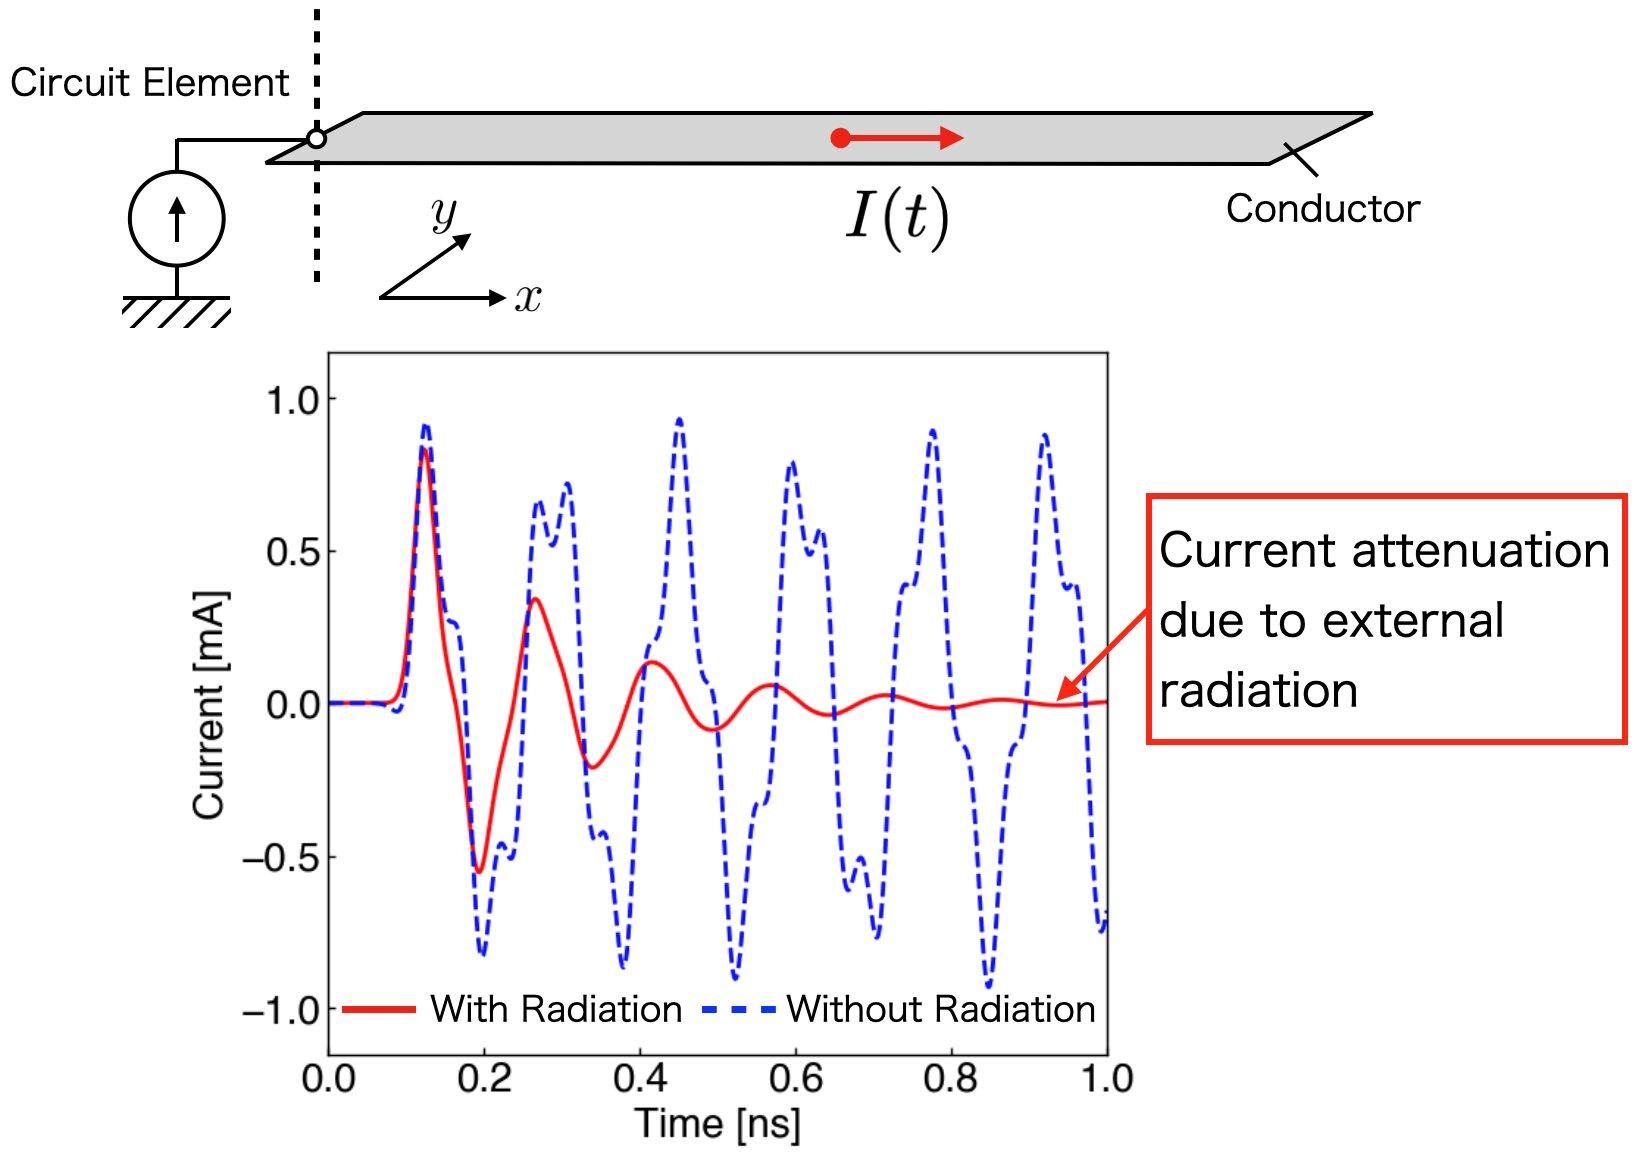 Tuning in the noise? New electromagnetic circuit simulator visualizes radiation phenomena